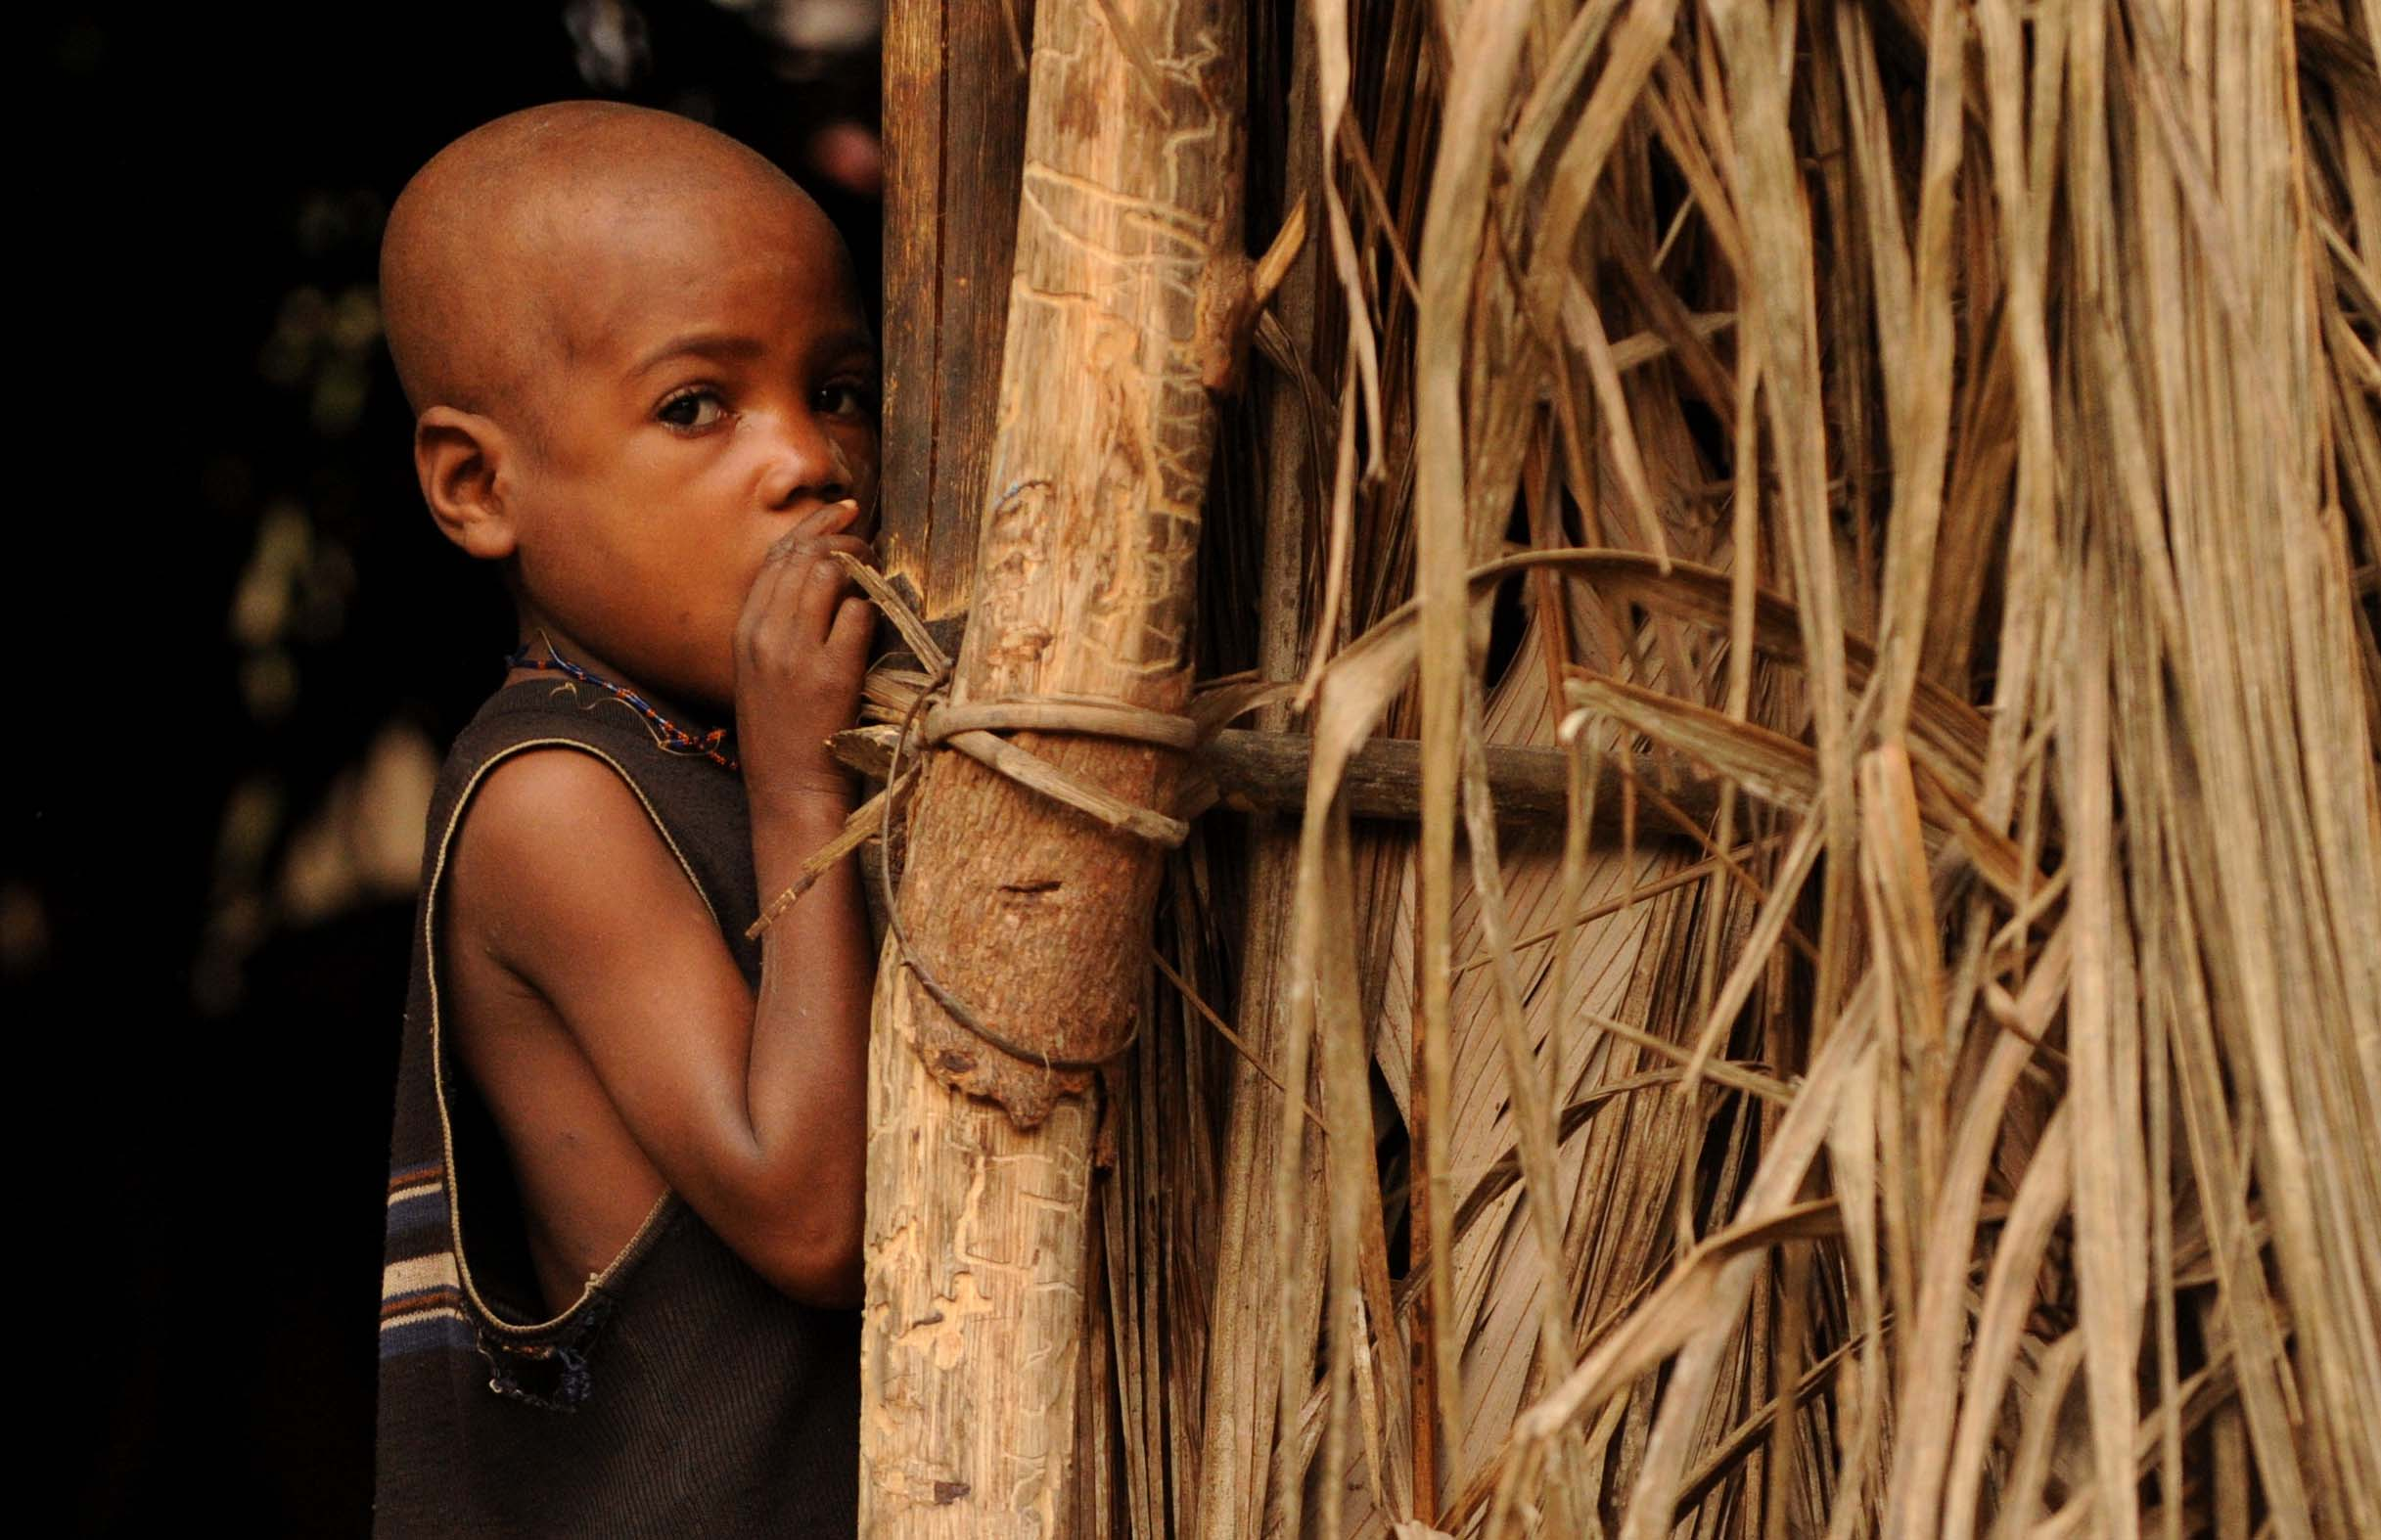 CAMEROON 034